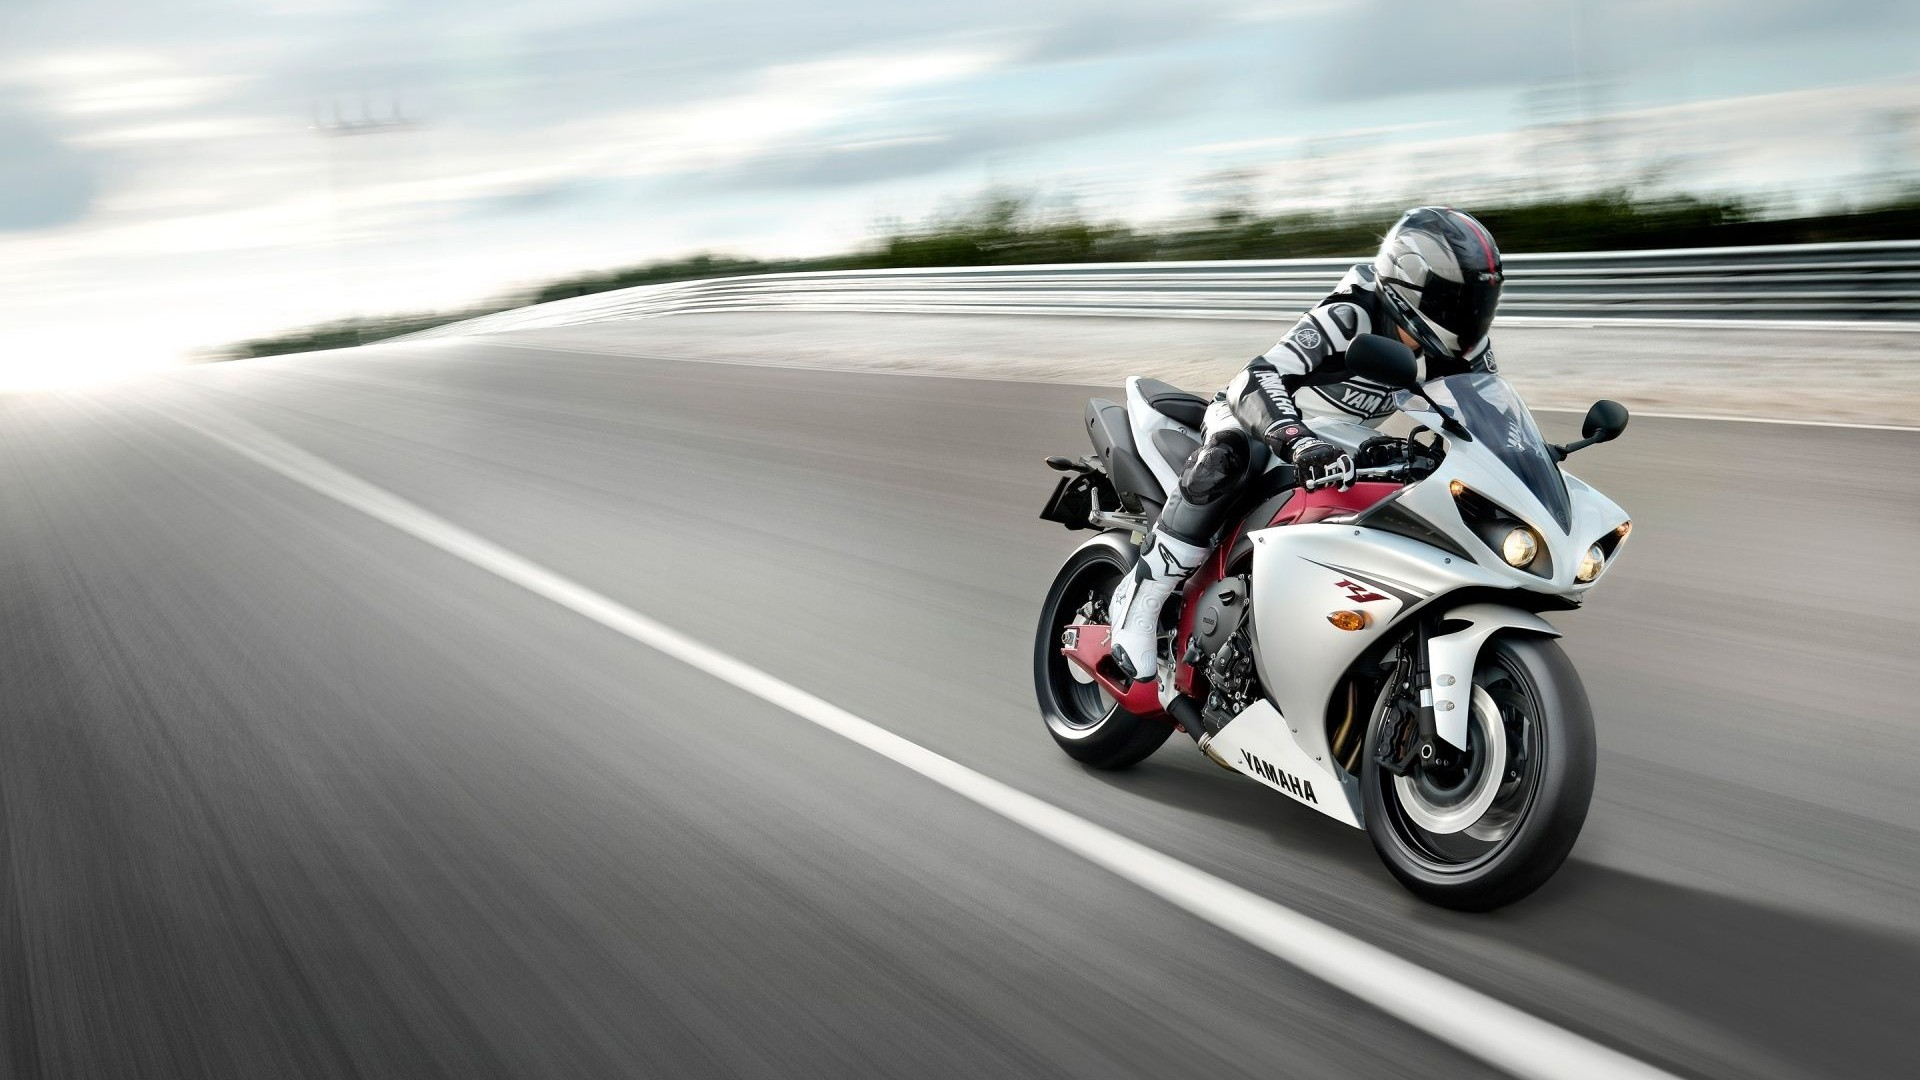 Yamaha R1 Wallpapers (50 Wallpapers)